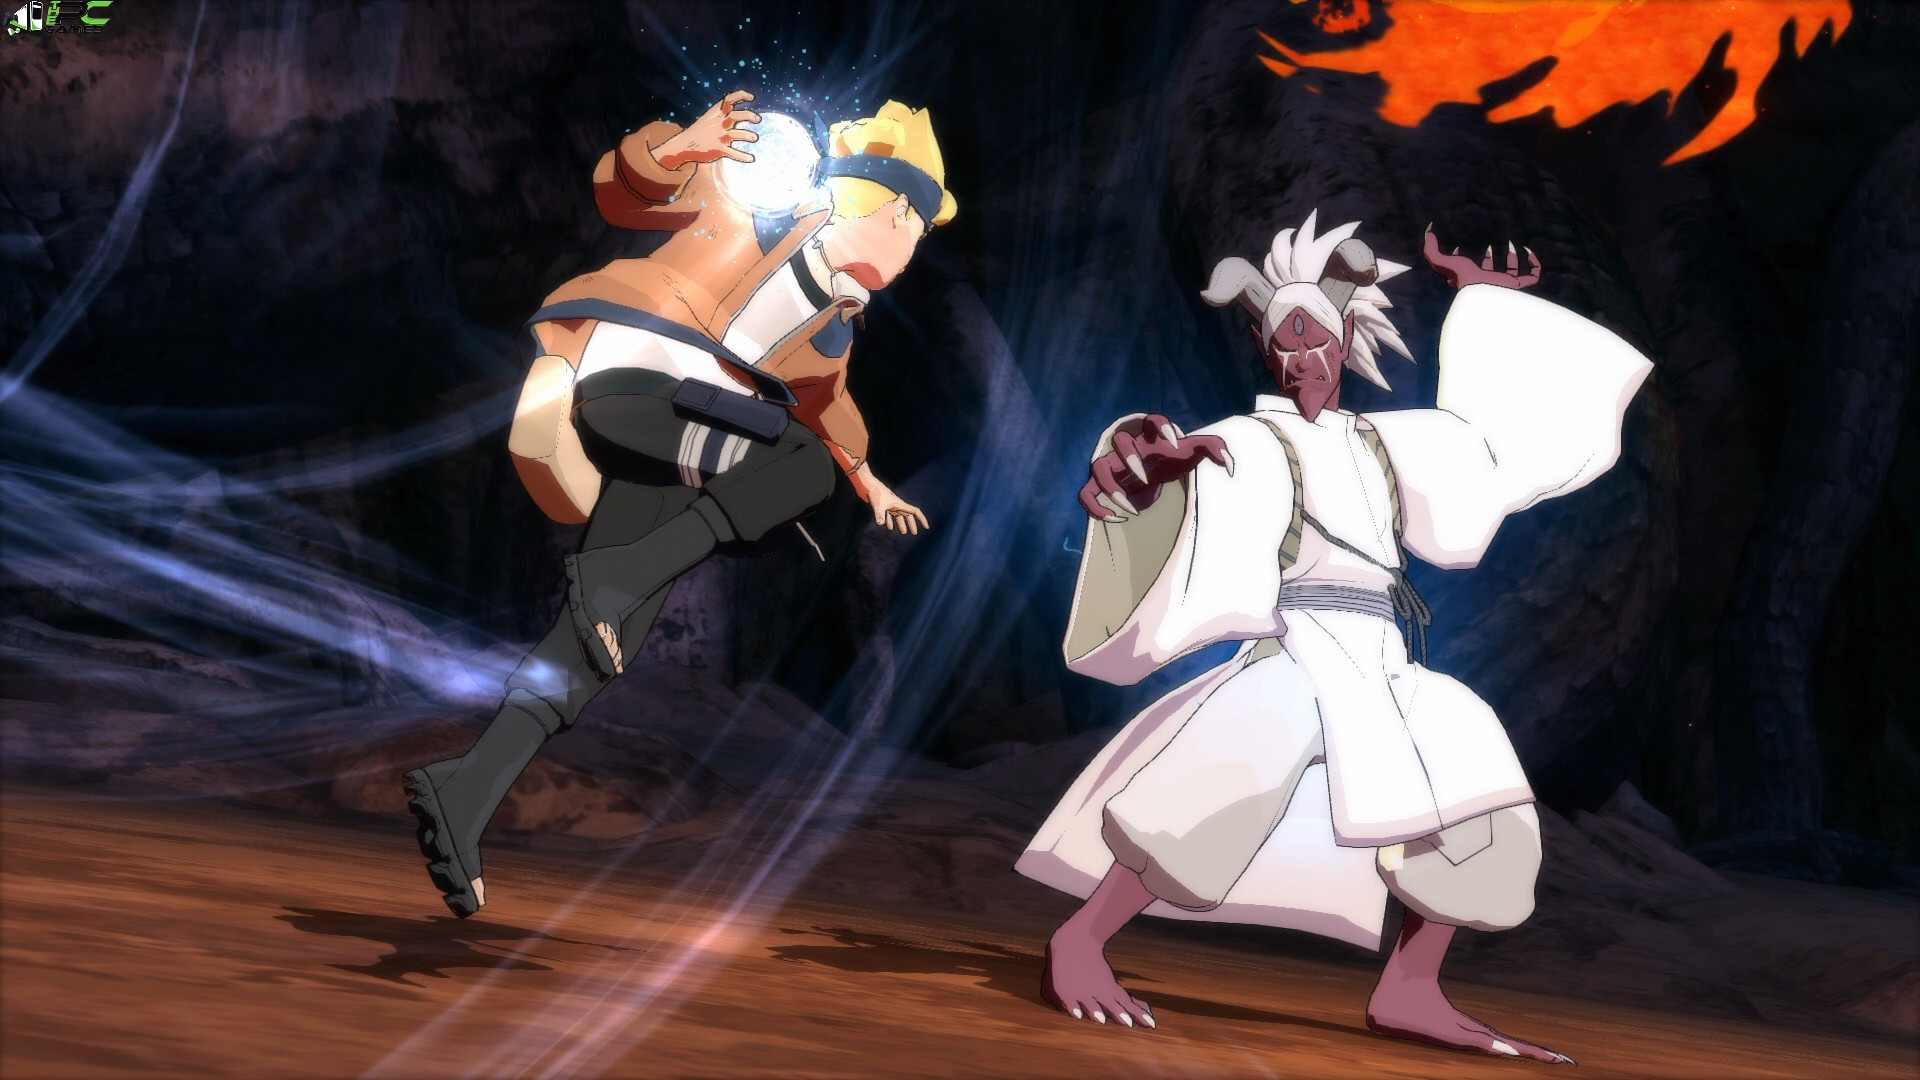 Boruto: Naruto Next Generation- Plot And Preview Of New Episodes!